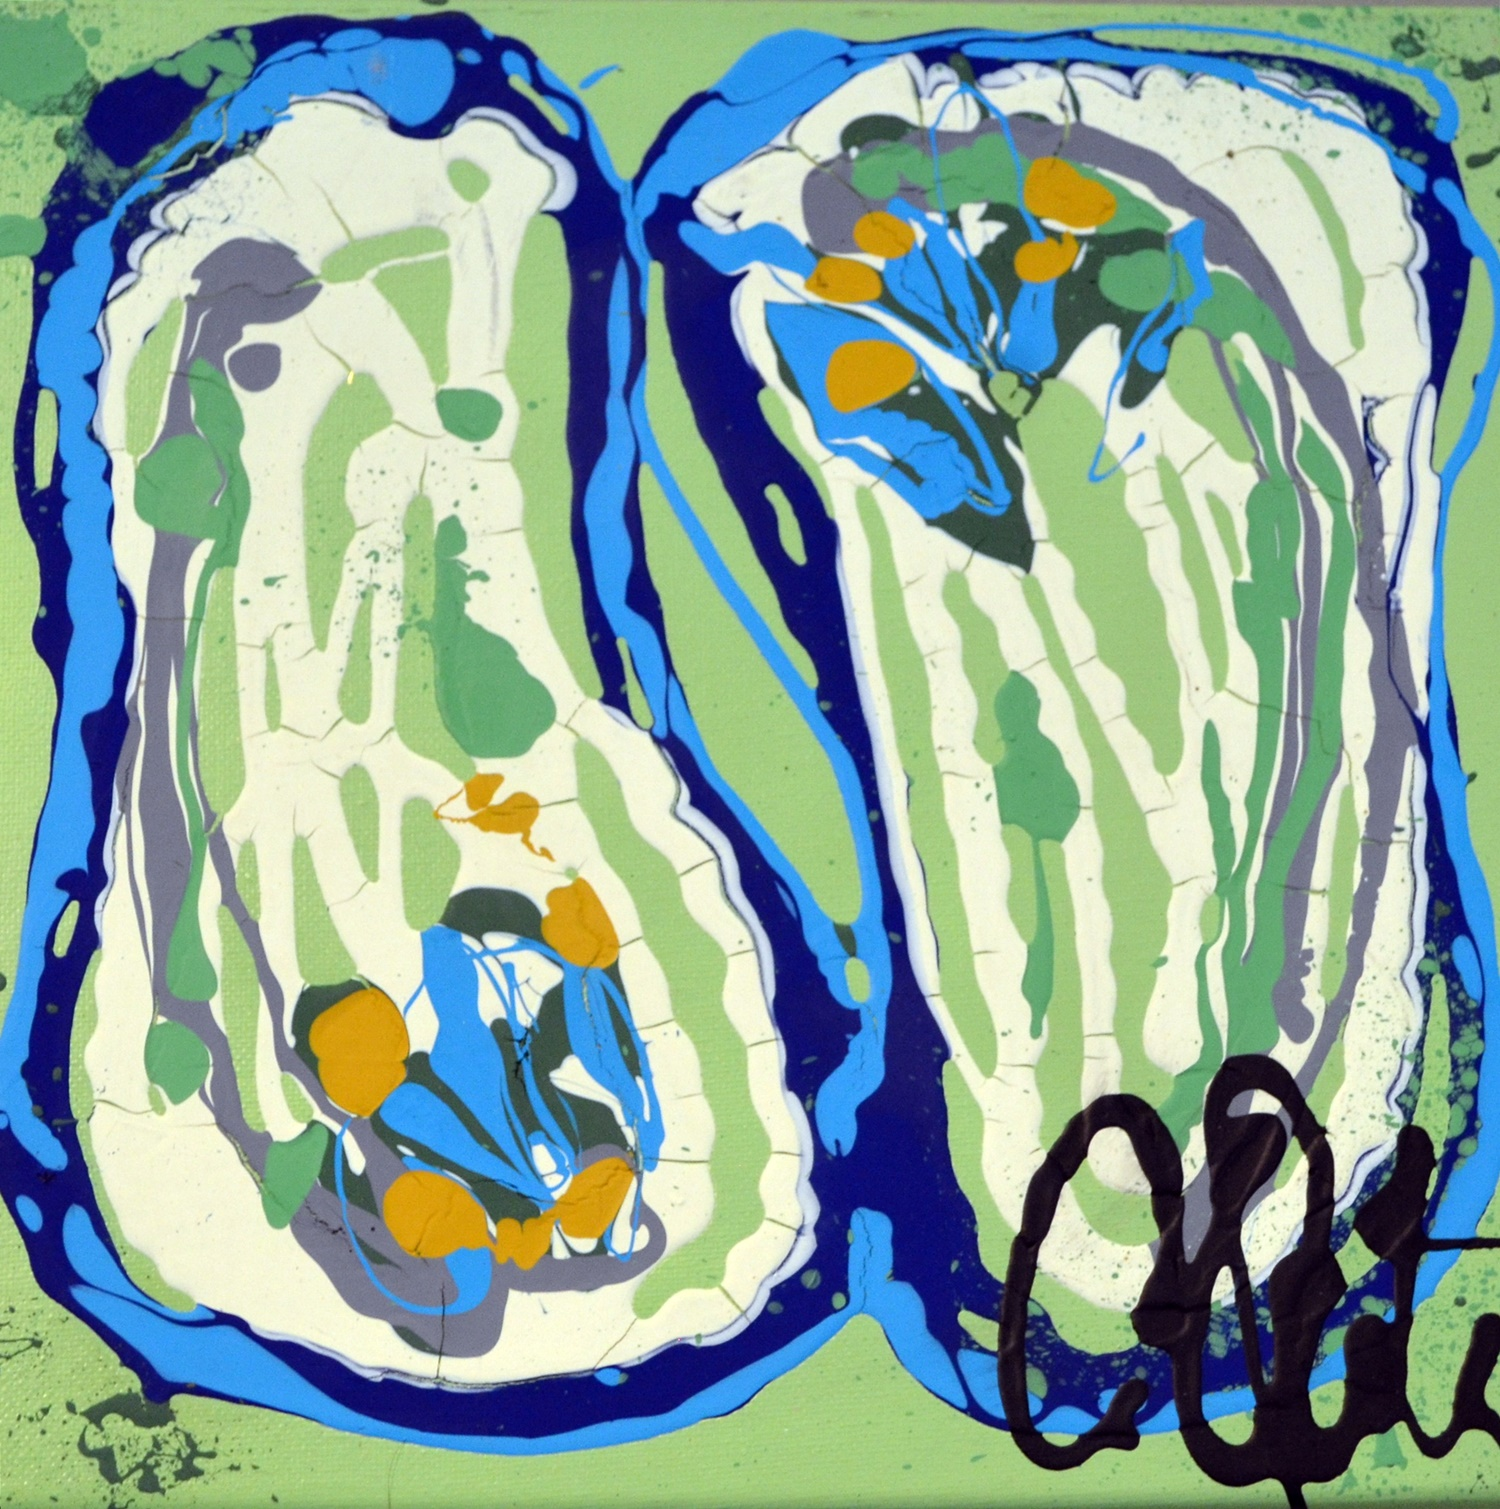 Camille Quintana_Double Oysters (Sage)_Acrylic on Canvas_2014_12x12.JPG